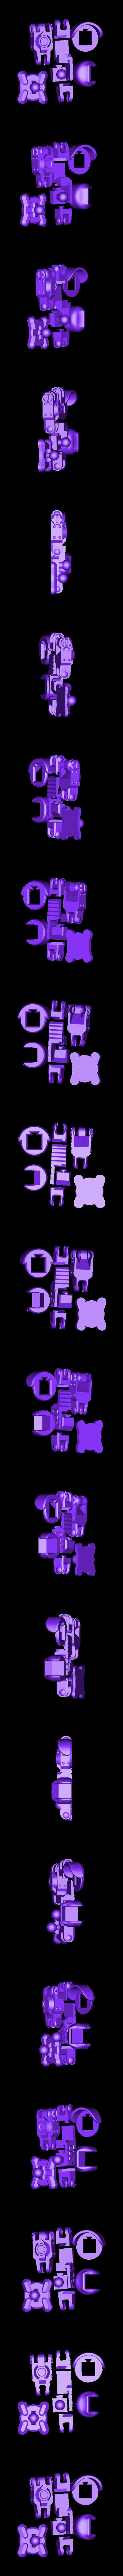 LEFT_LEG_ASSMEBLY.STL Télécharger fichier STL gratuit Gorbo Tankoped • Objet à imprimer en 3D, Steyrc